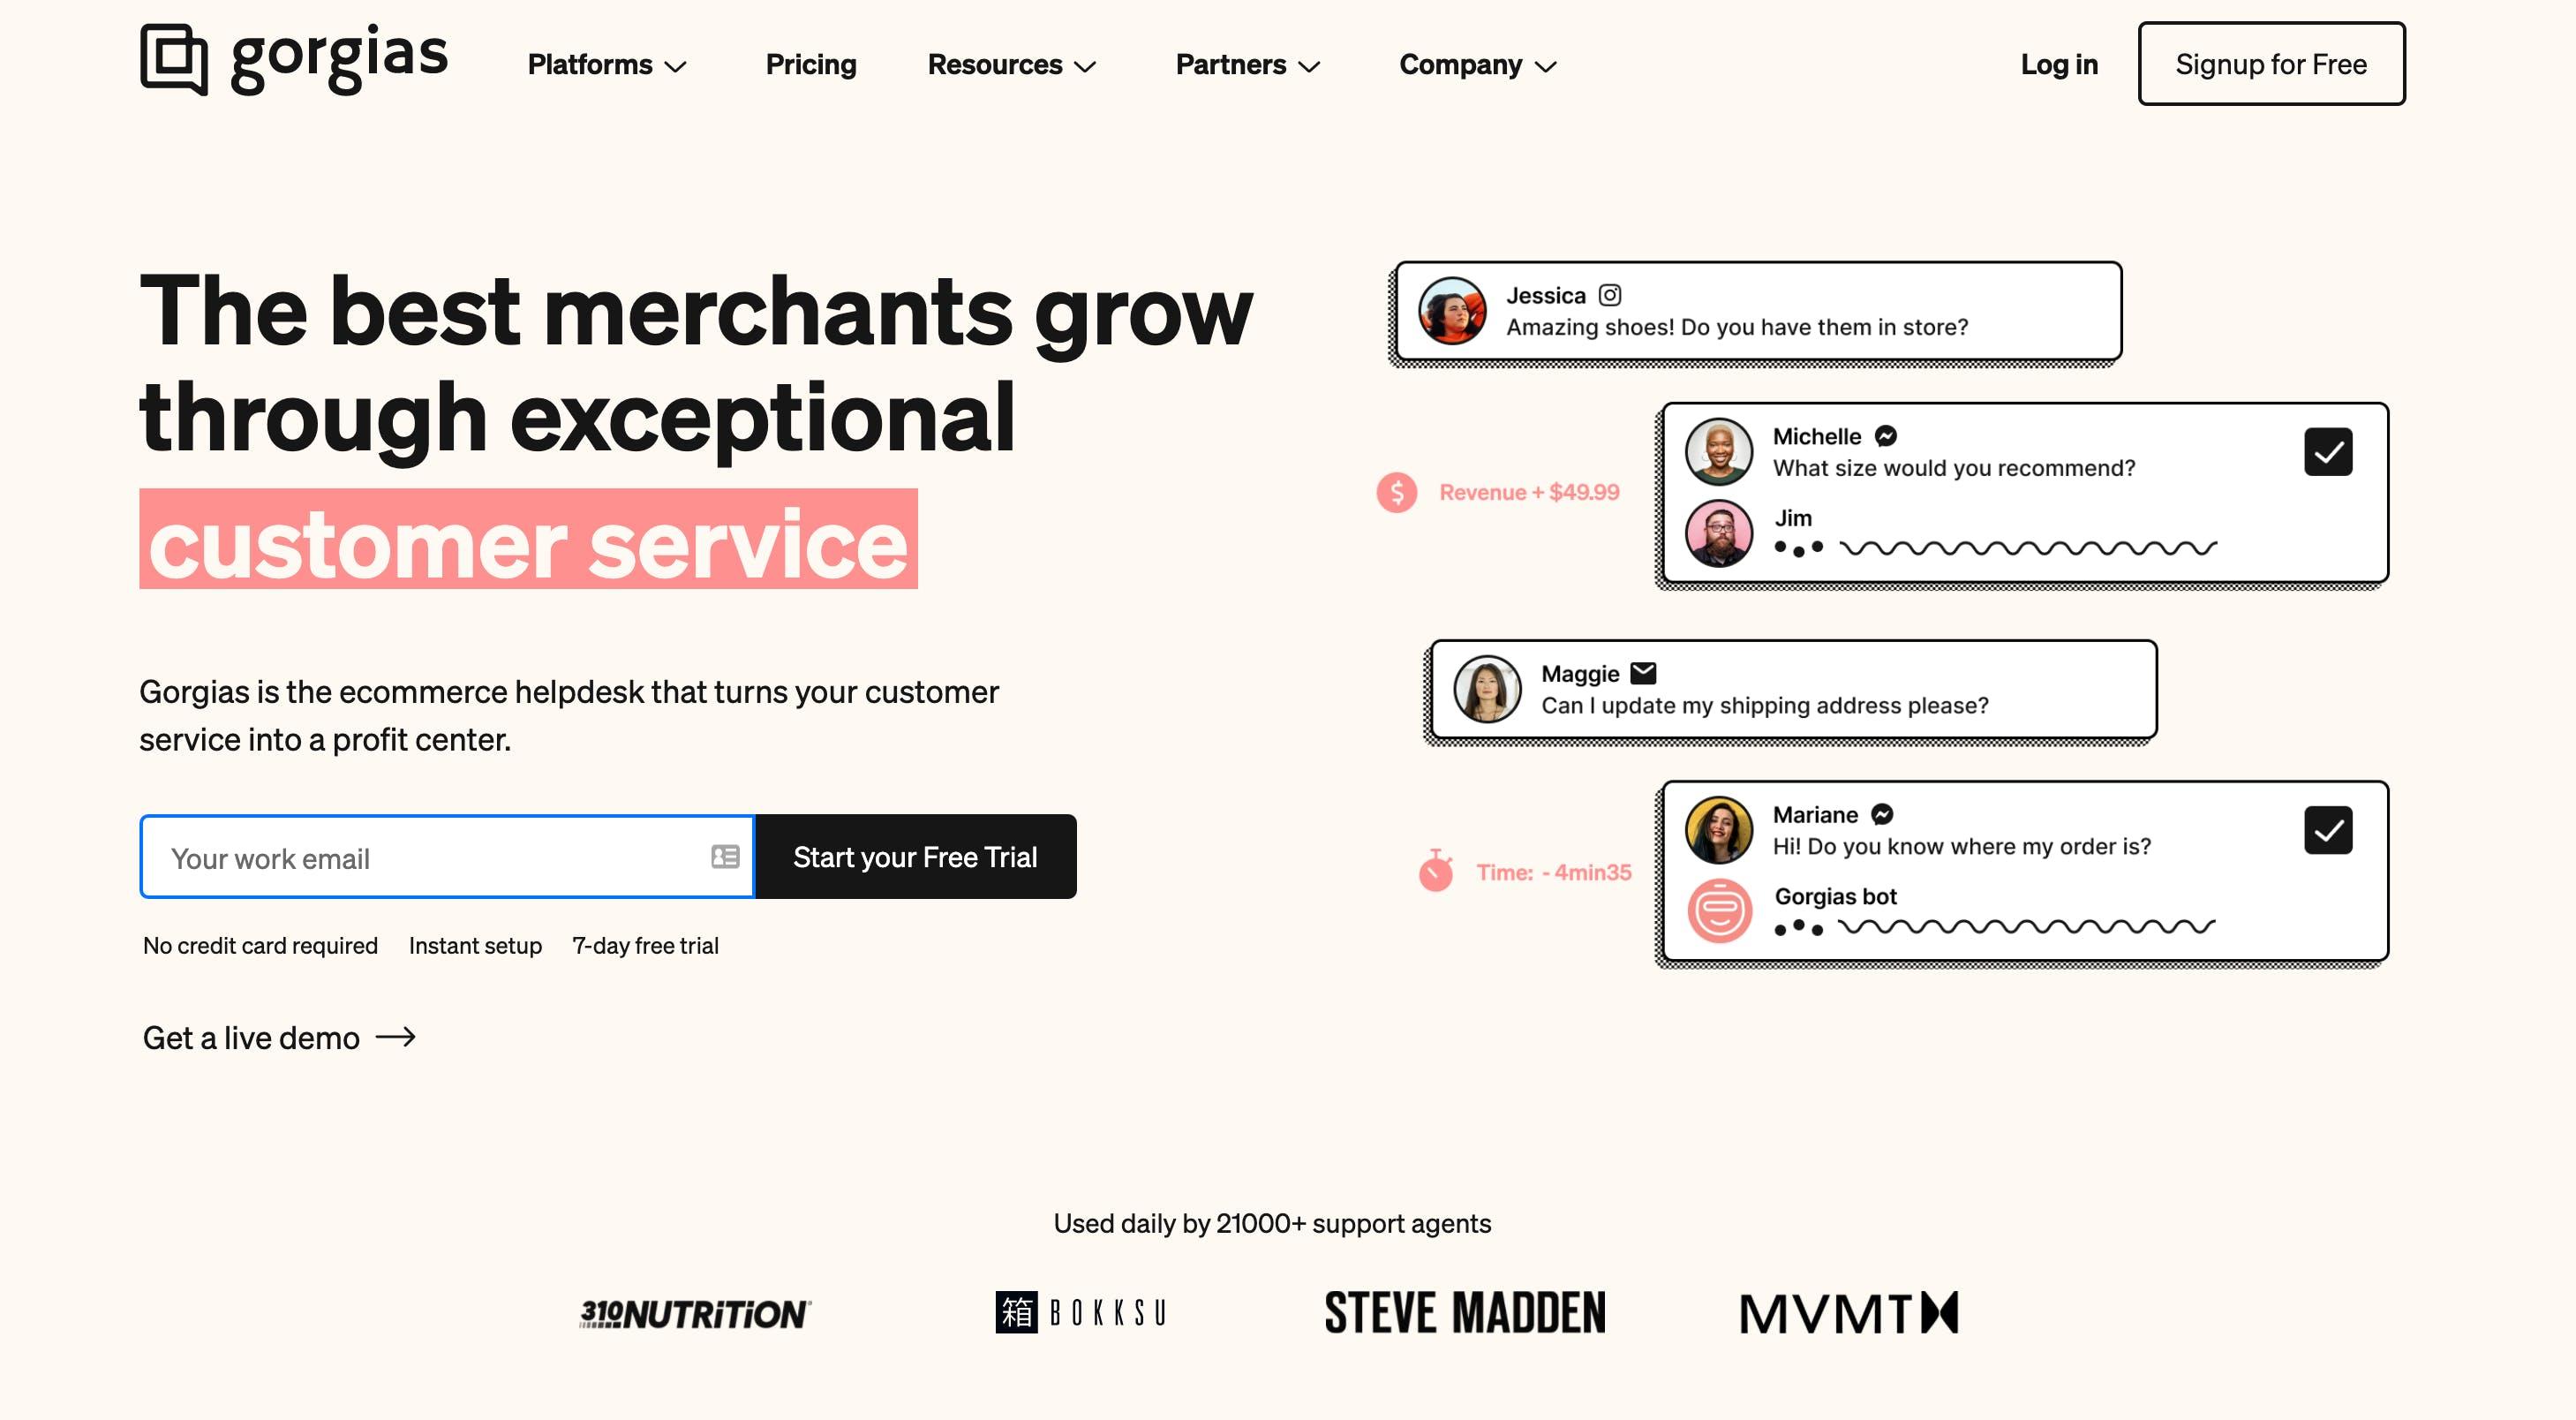 Gorgias customer service homepage